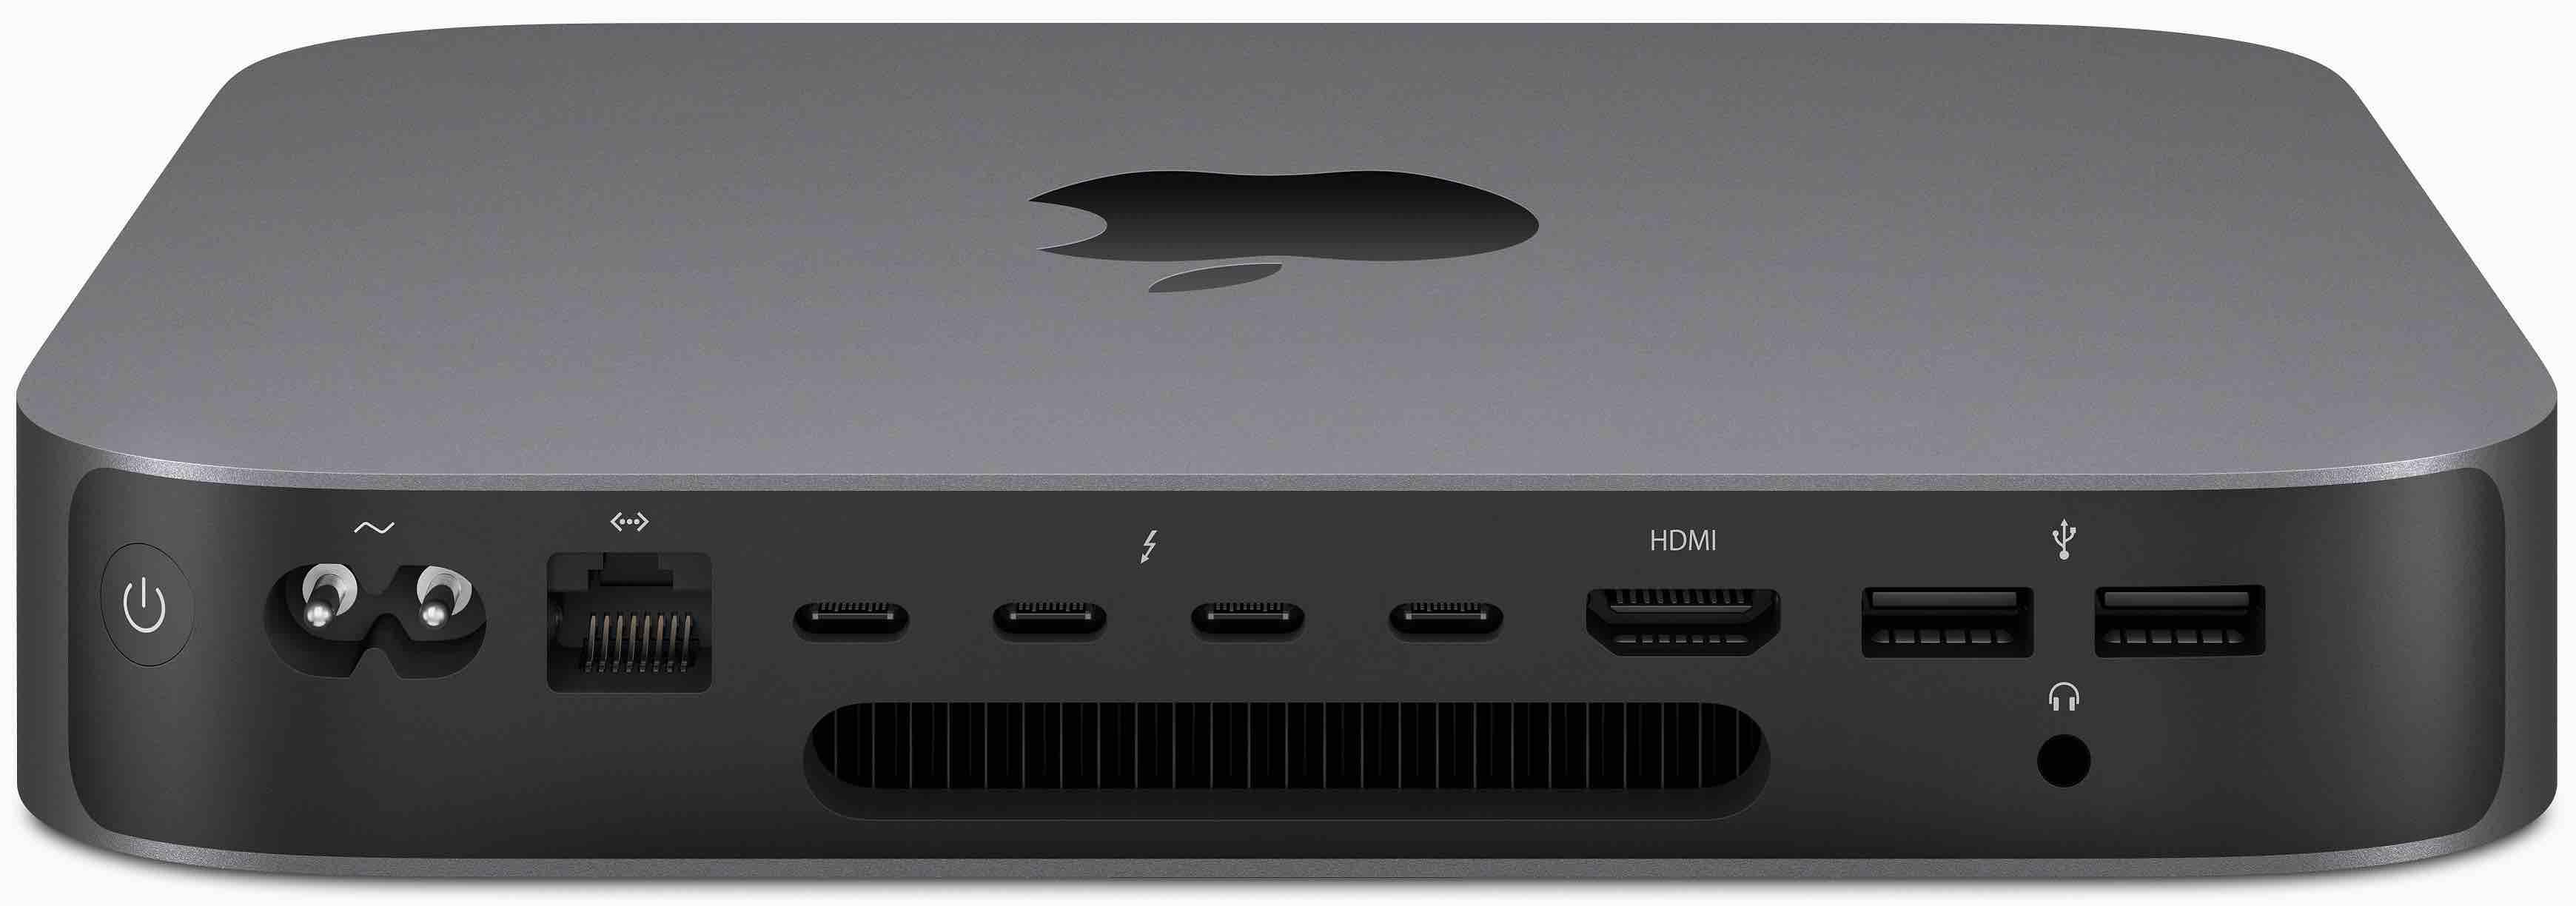 Mac mini 2018 back